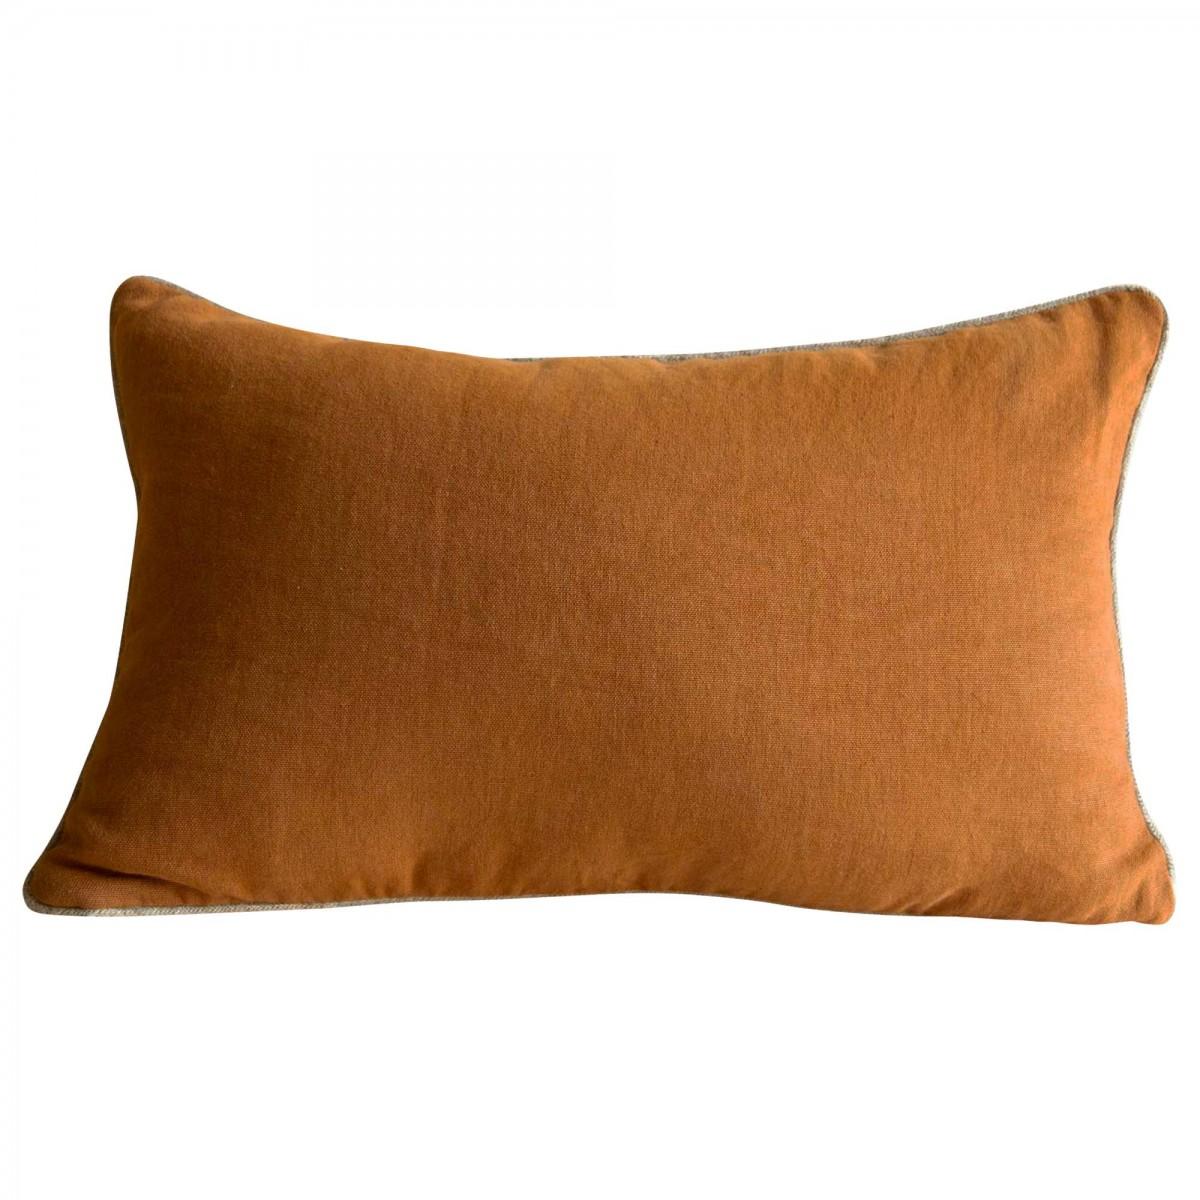 Housse de coussin en lin marron caramel 40x65